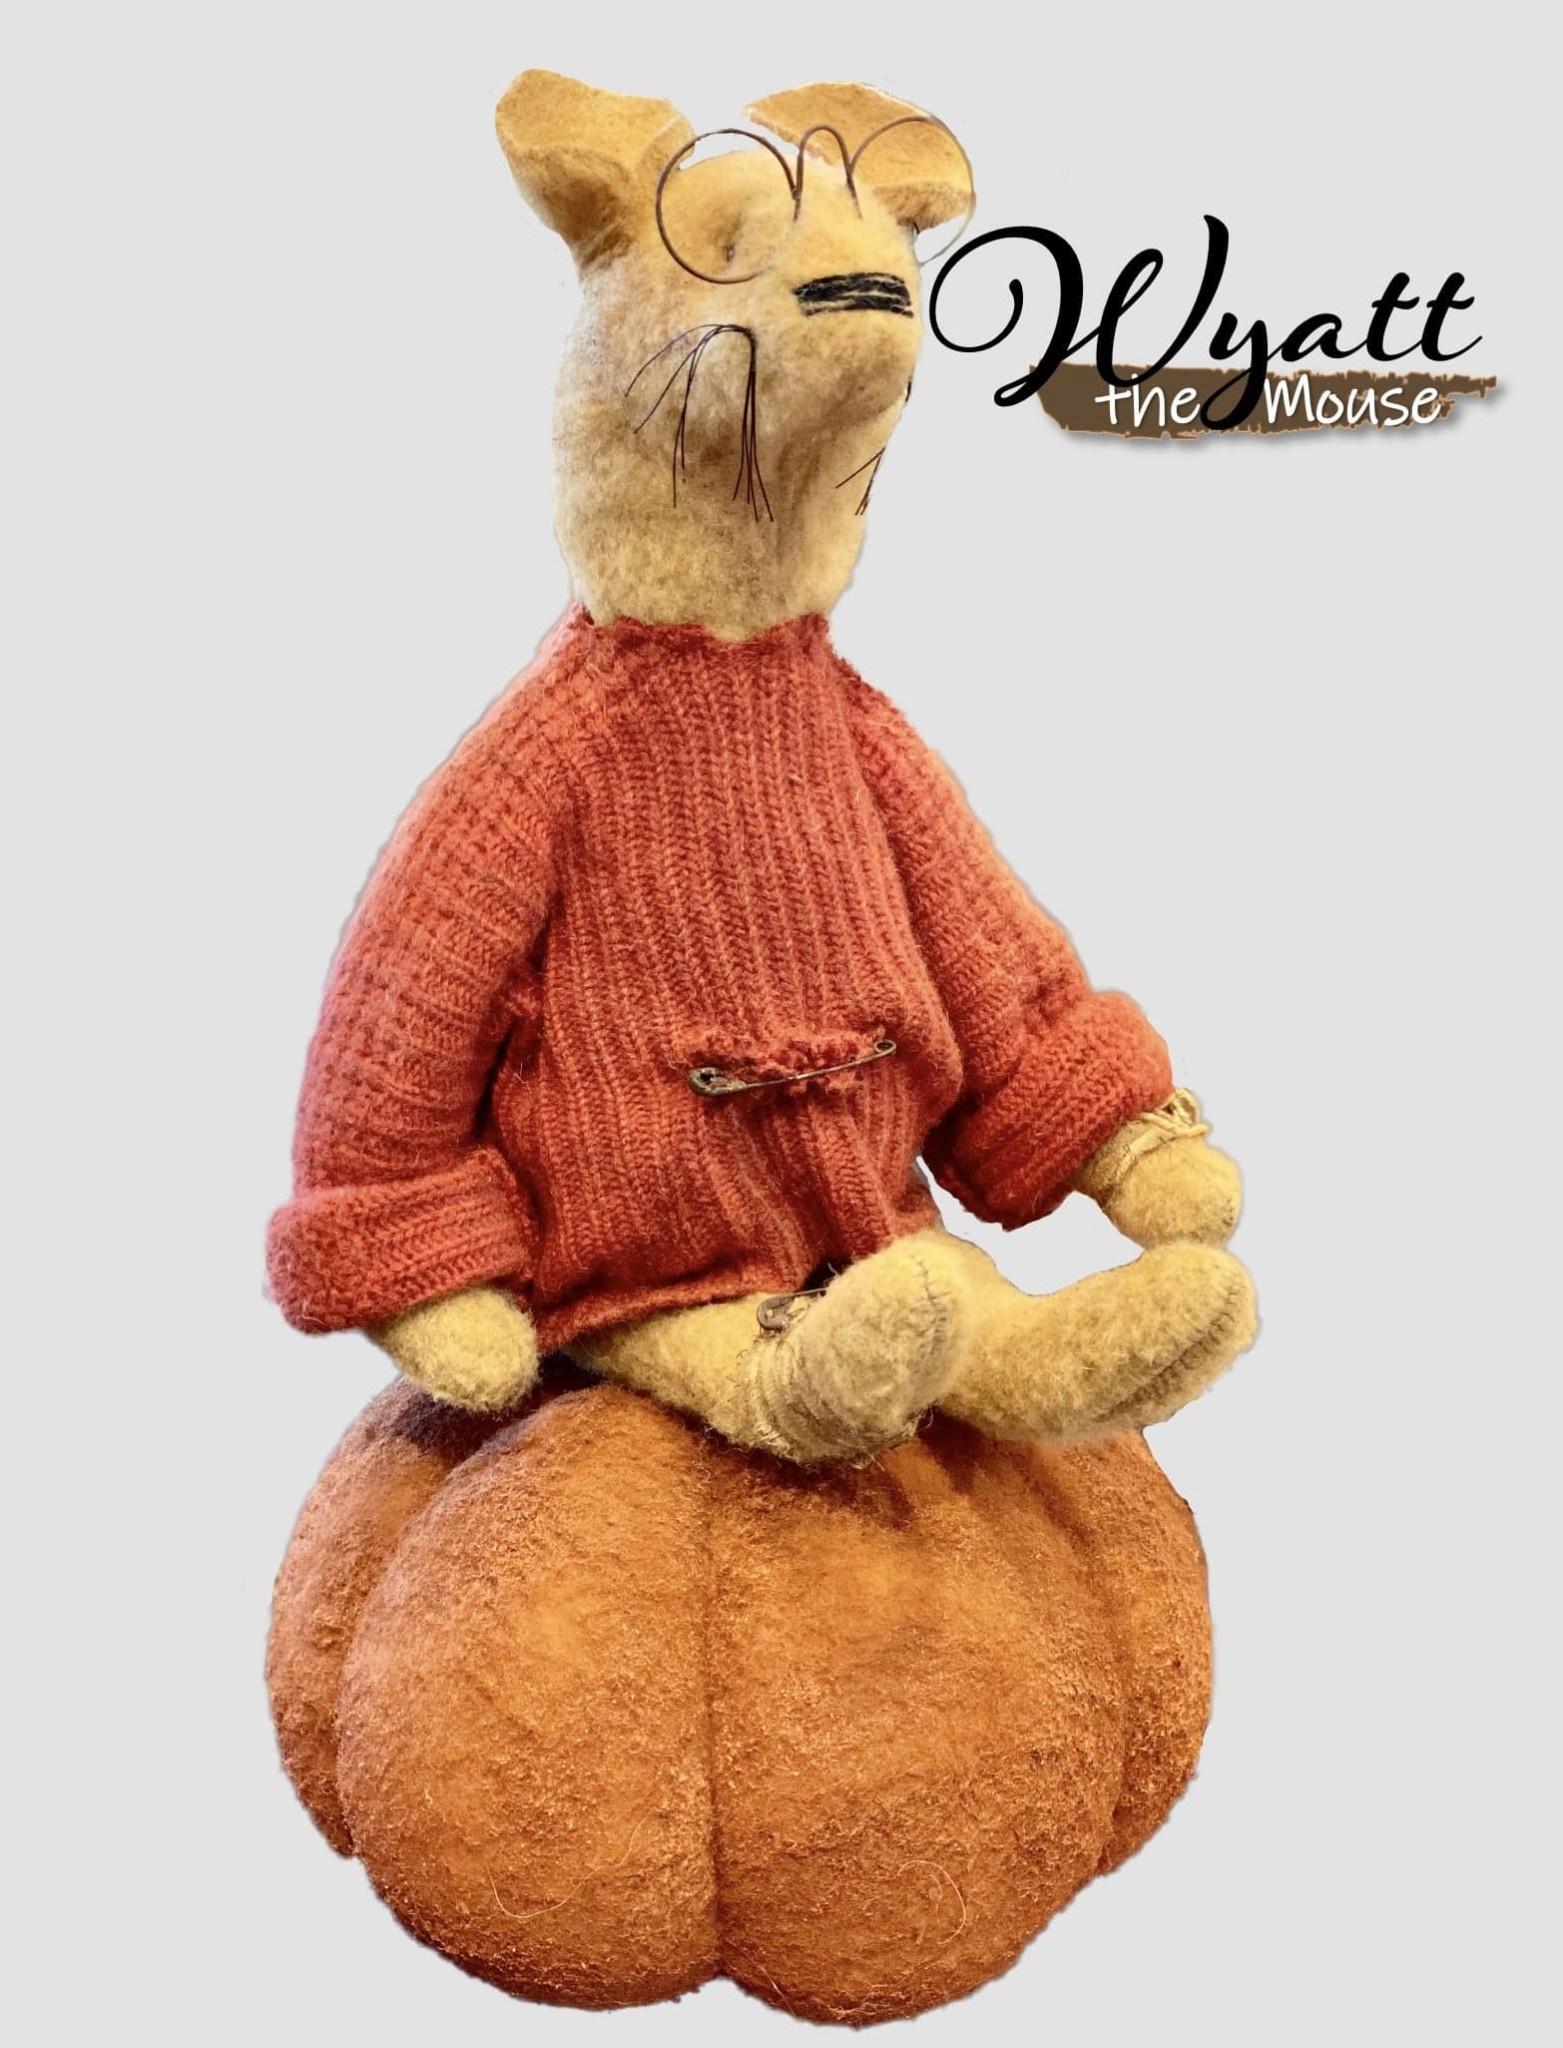 Nana's Farmhouse Wyatt The Mouse Orange Sweater Sitting On A Pumpkin